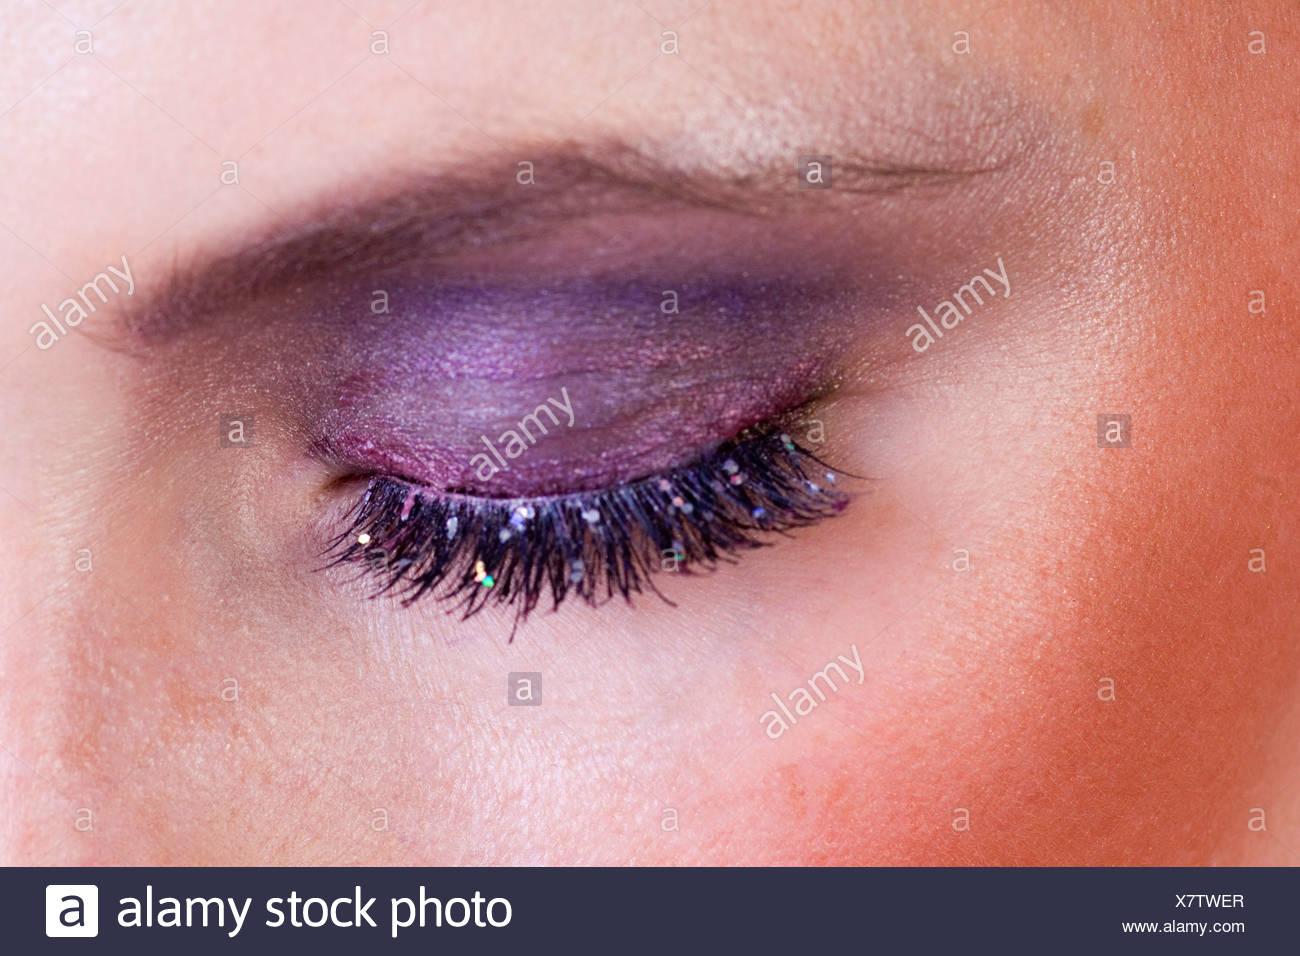 violett eye shadow - Stock Image